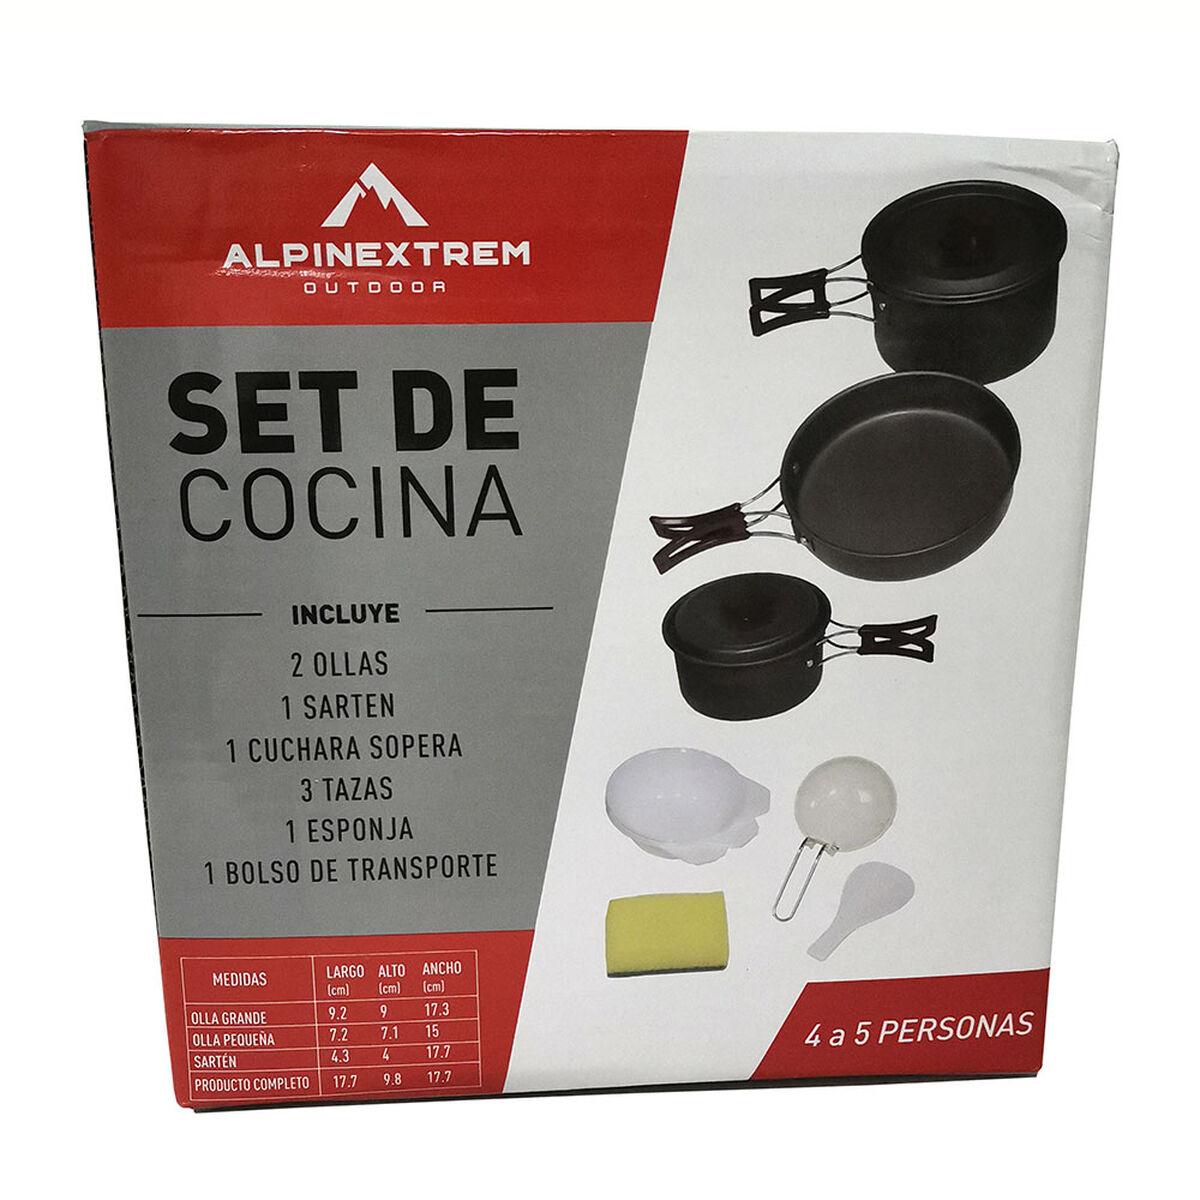 Set de Cocina Alpinextrem para 4 Personas